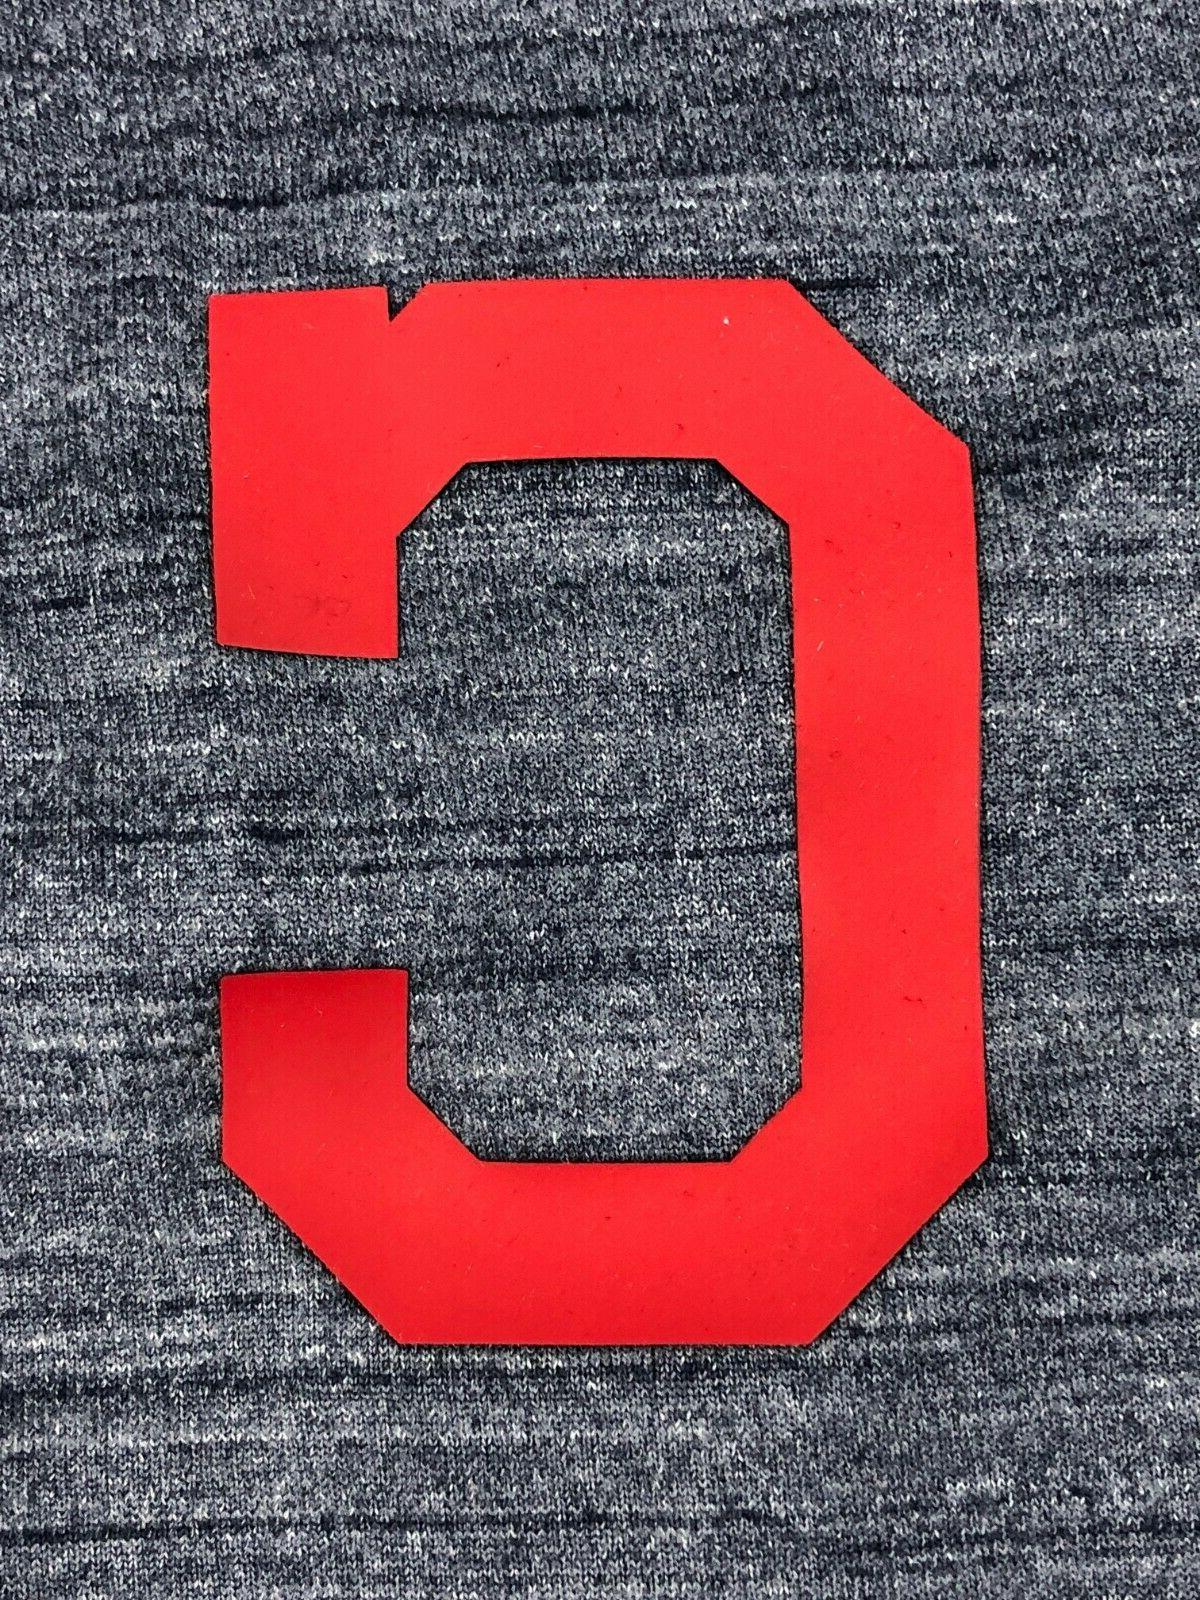 Cleveland Moisture Polo Shirt Size L